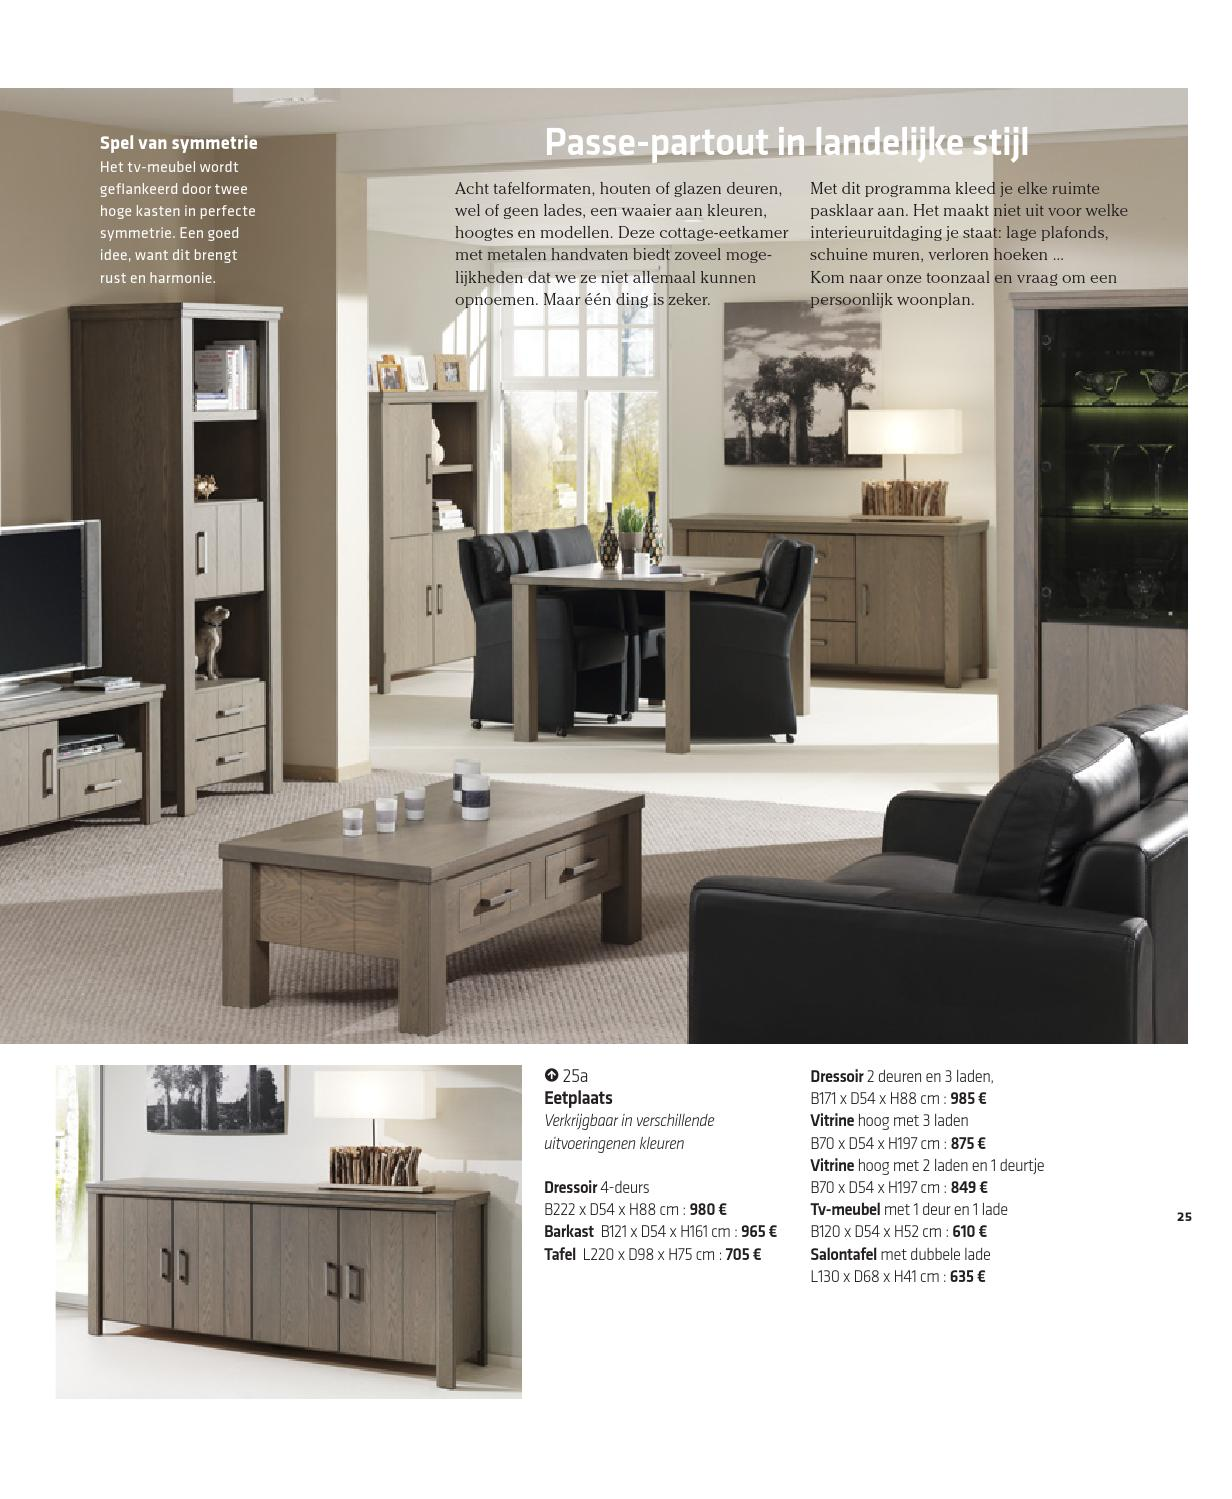 Catalogus Stevens Meubel Zomer 2014 by Hannibal - issuu